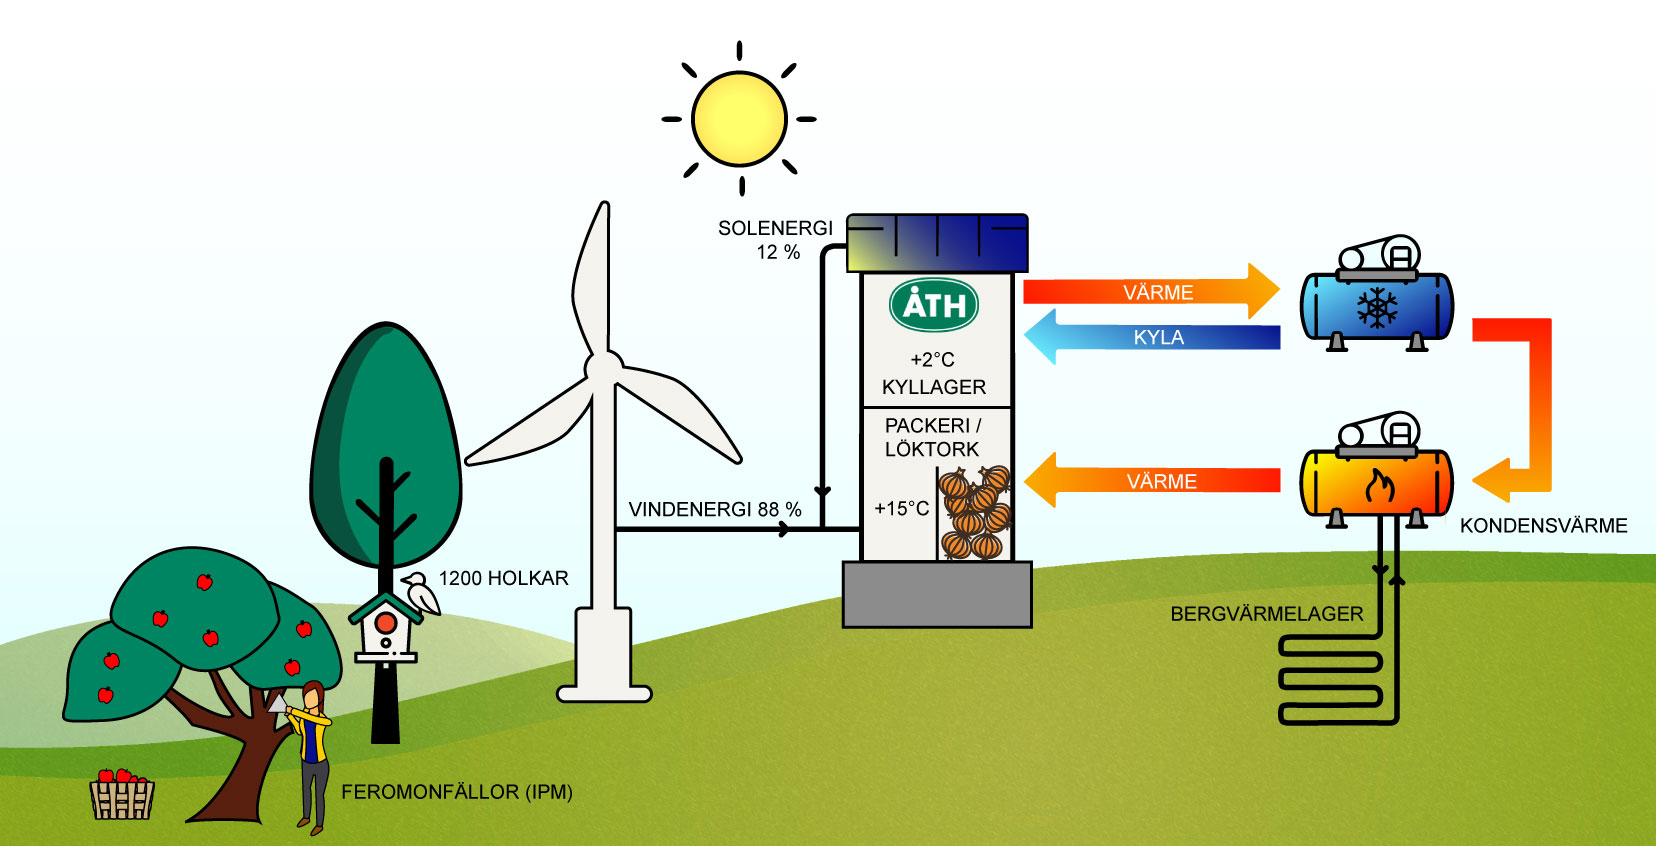 ÅTH Energisystem